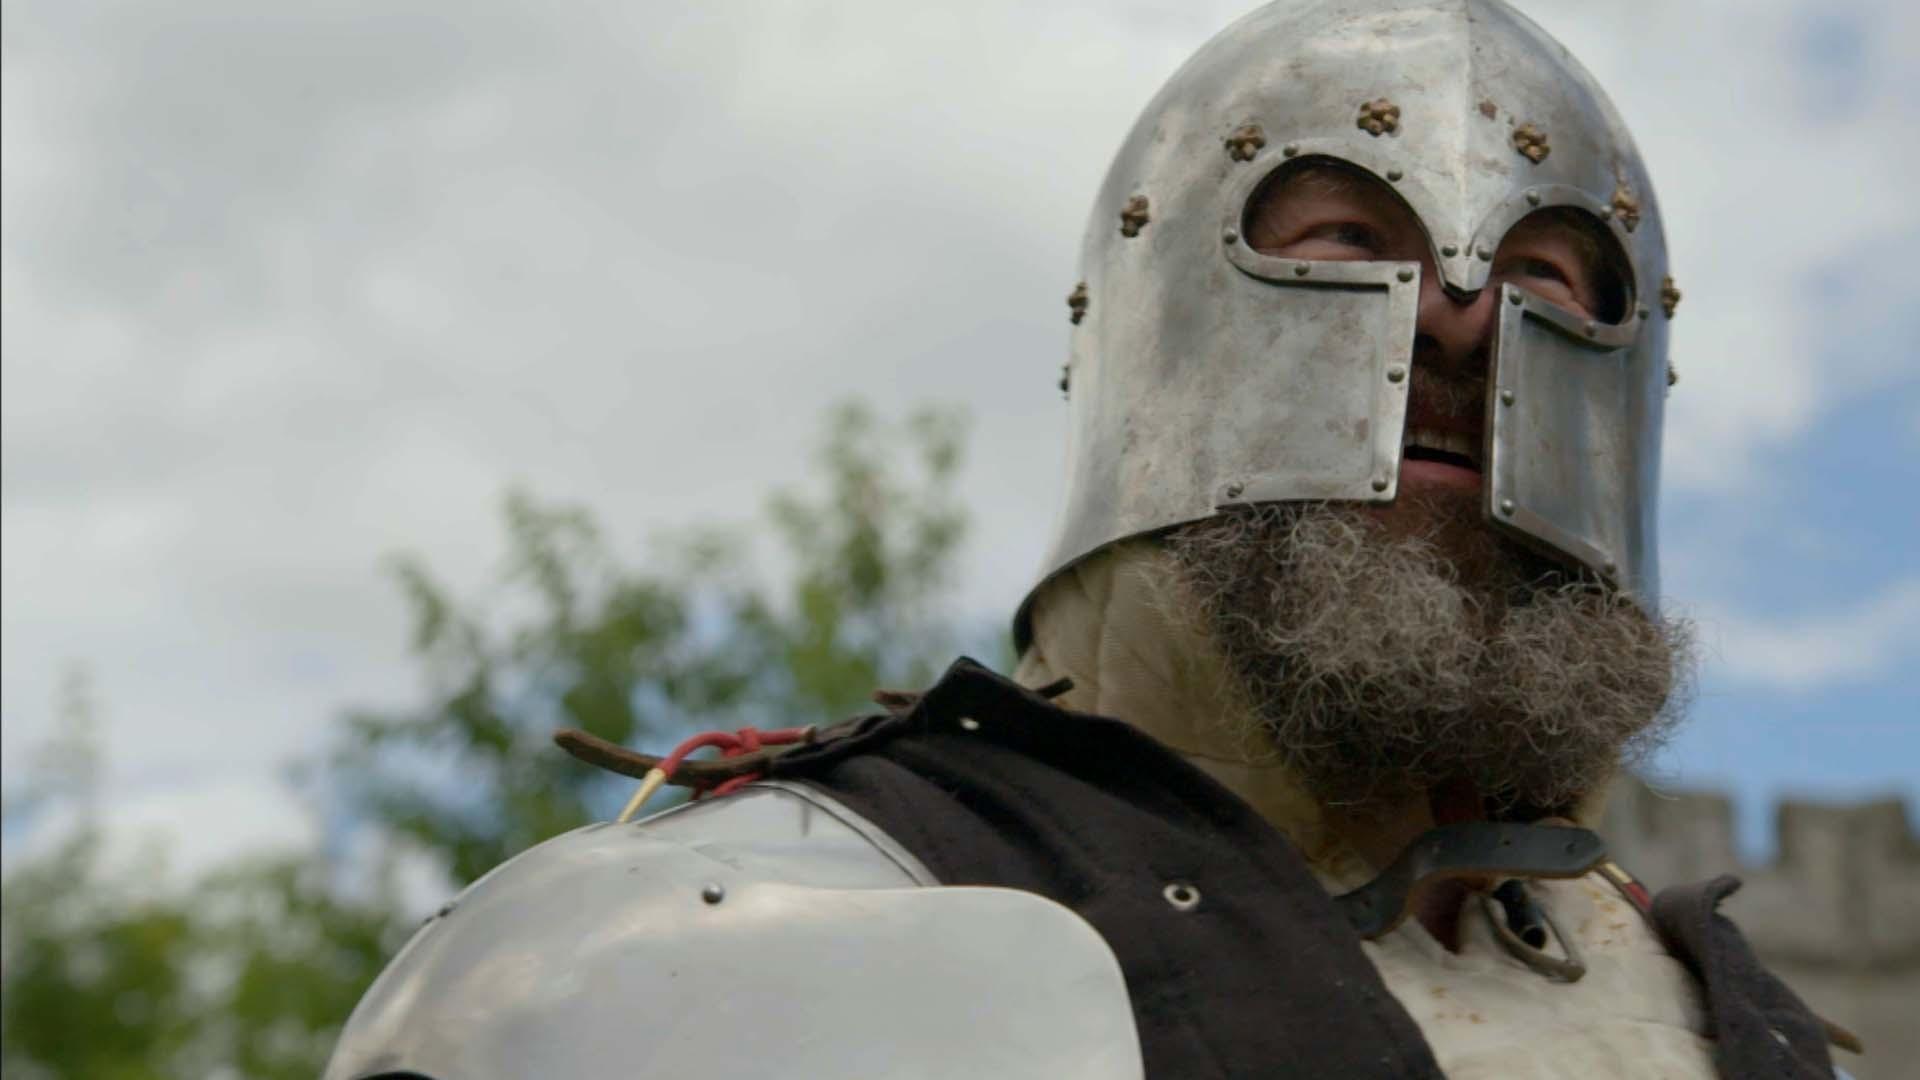 Musket v Medieval Armor Hero